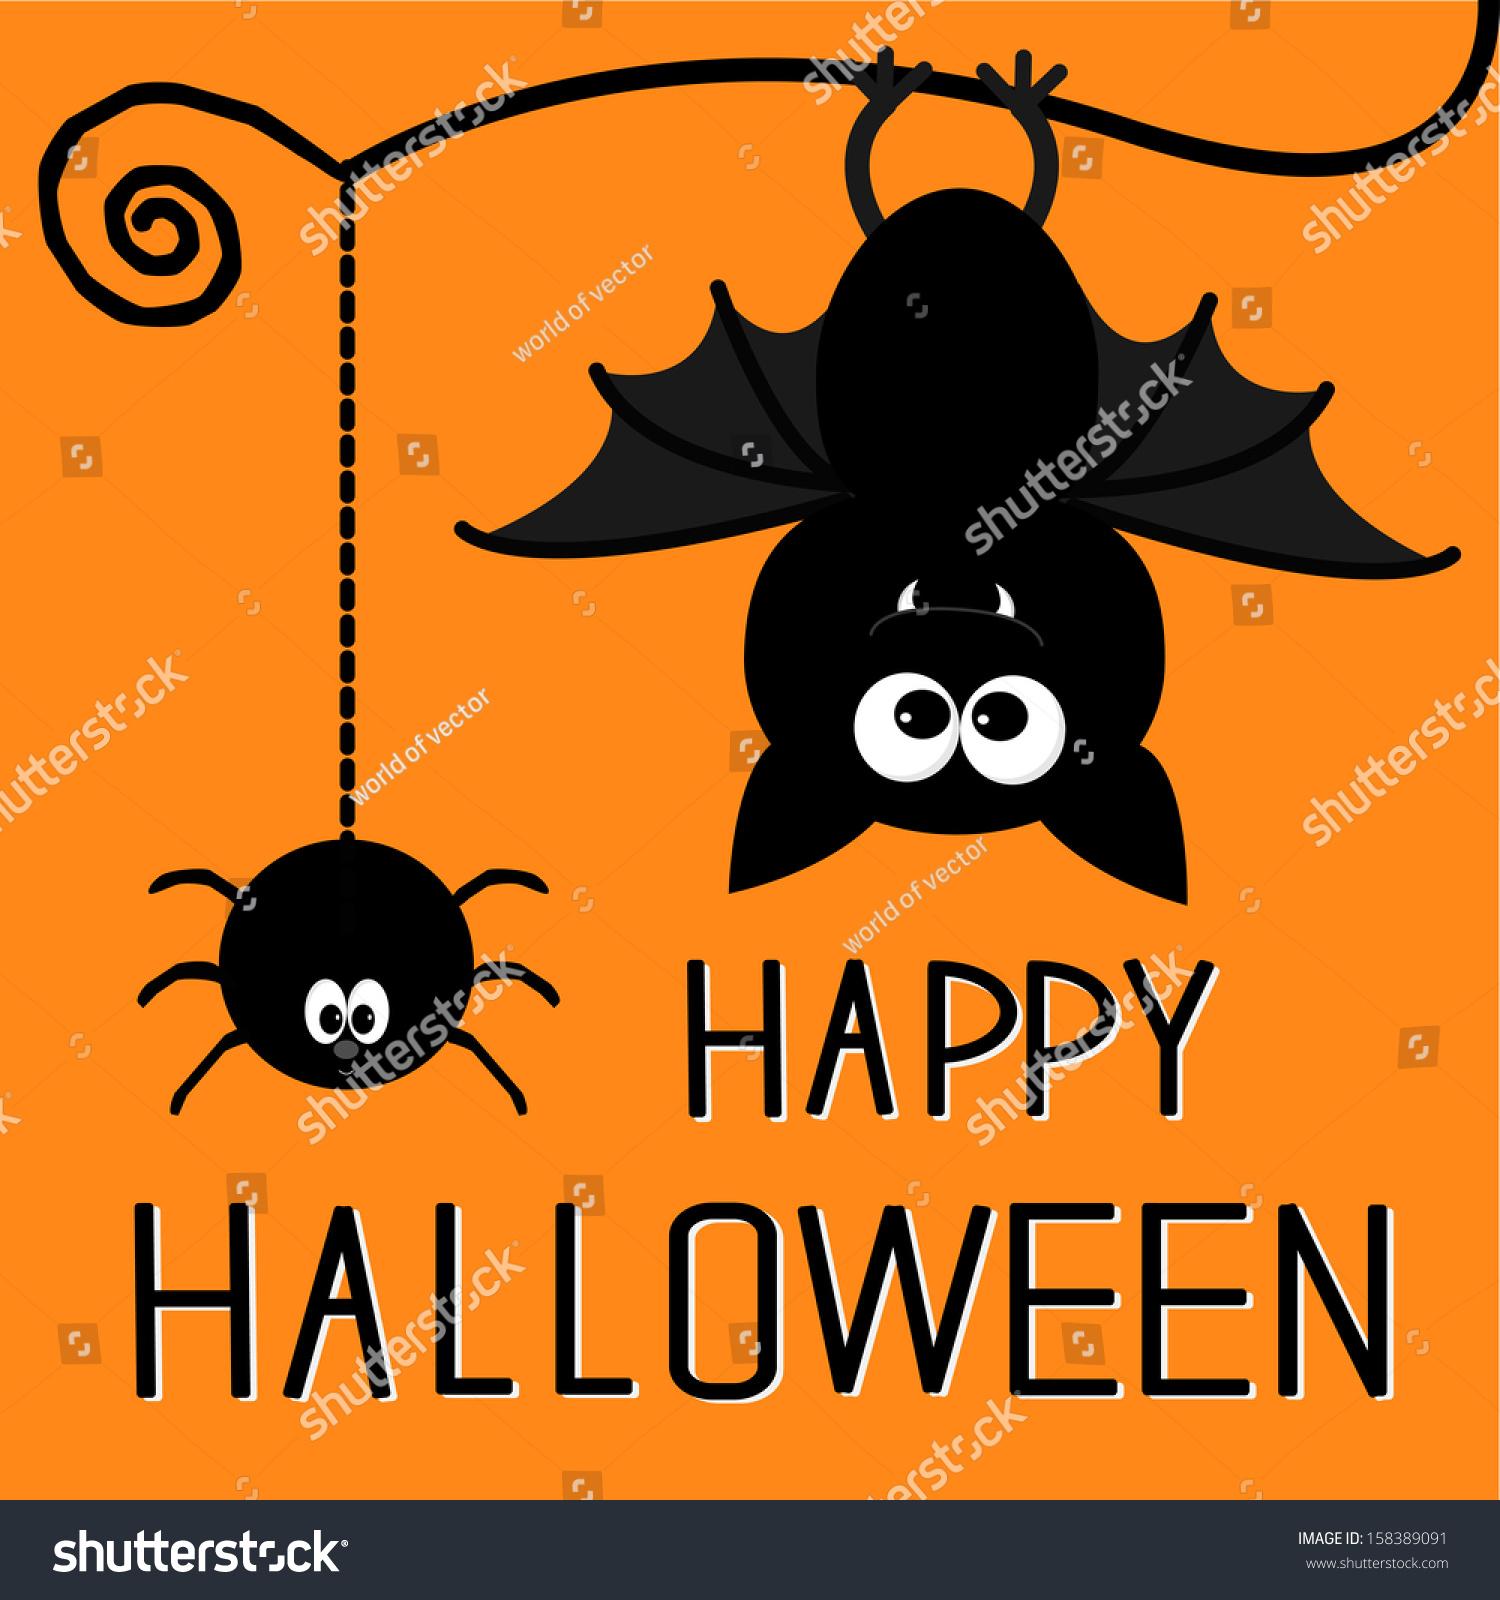 Naino Bat Dawnload Song: Cute Bat Hanging Spider Happy Halloween Stock Vector